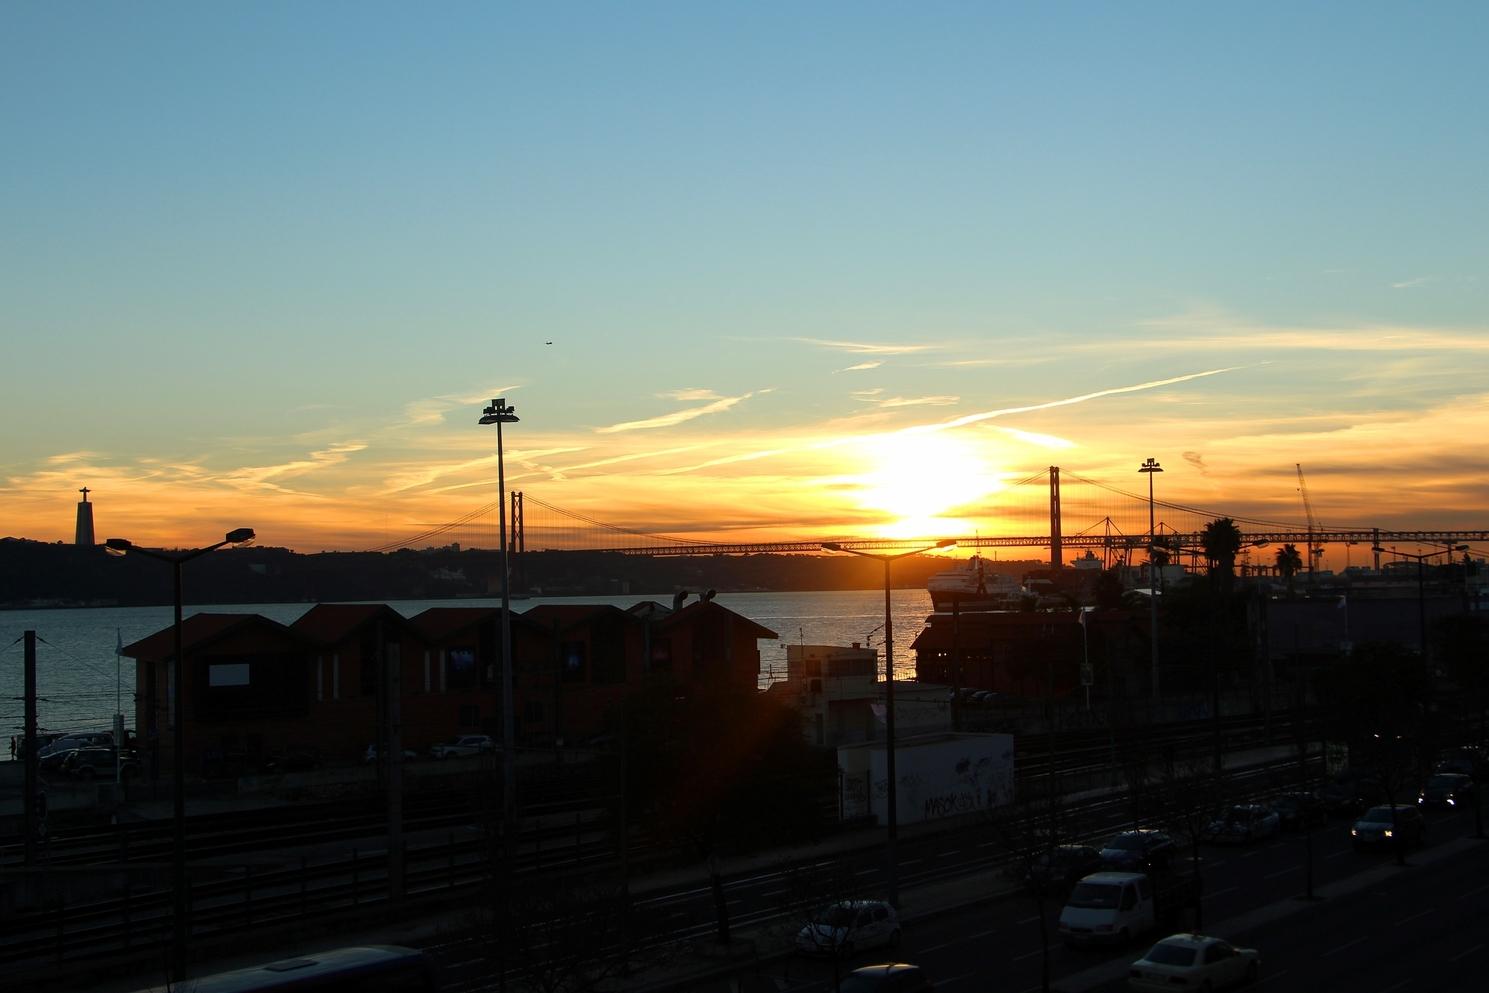 Sunset at Santos River Serviced Apartments